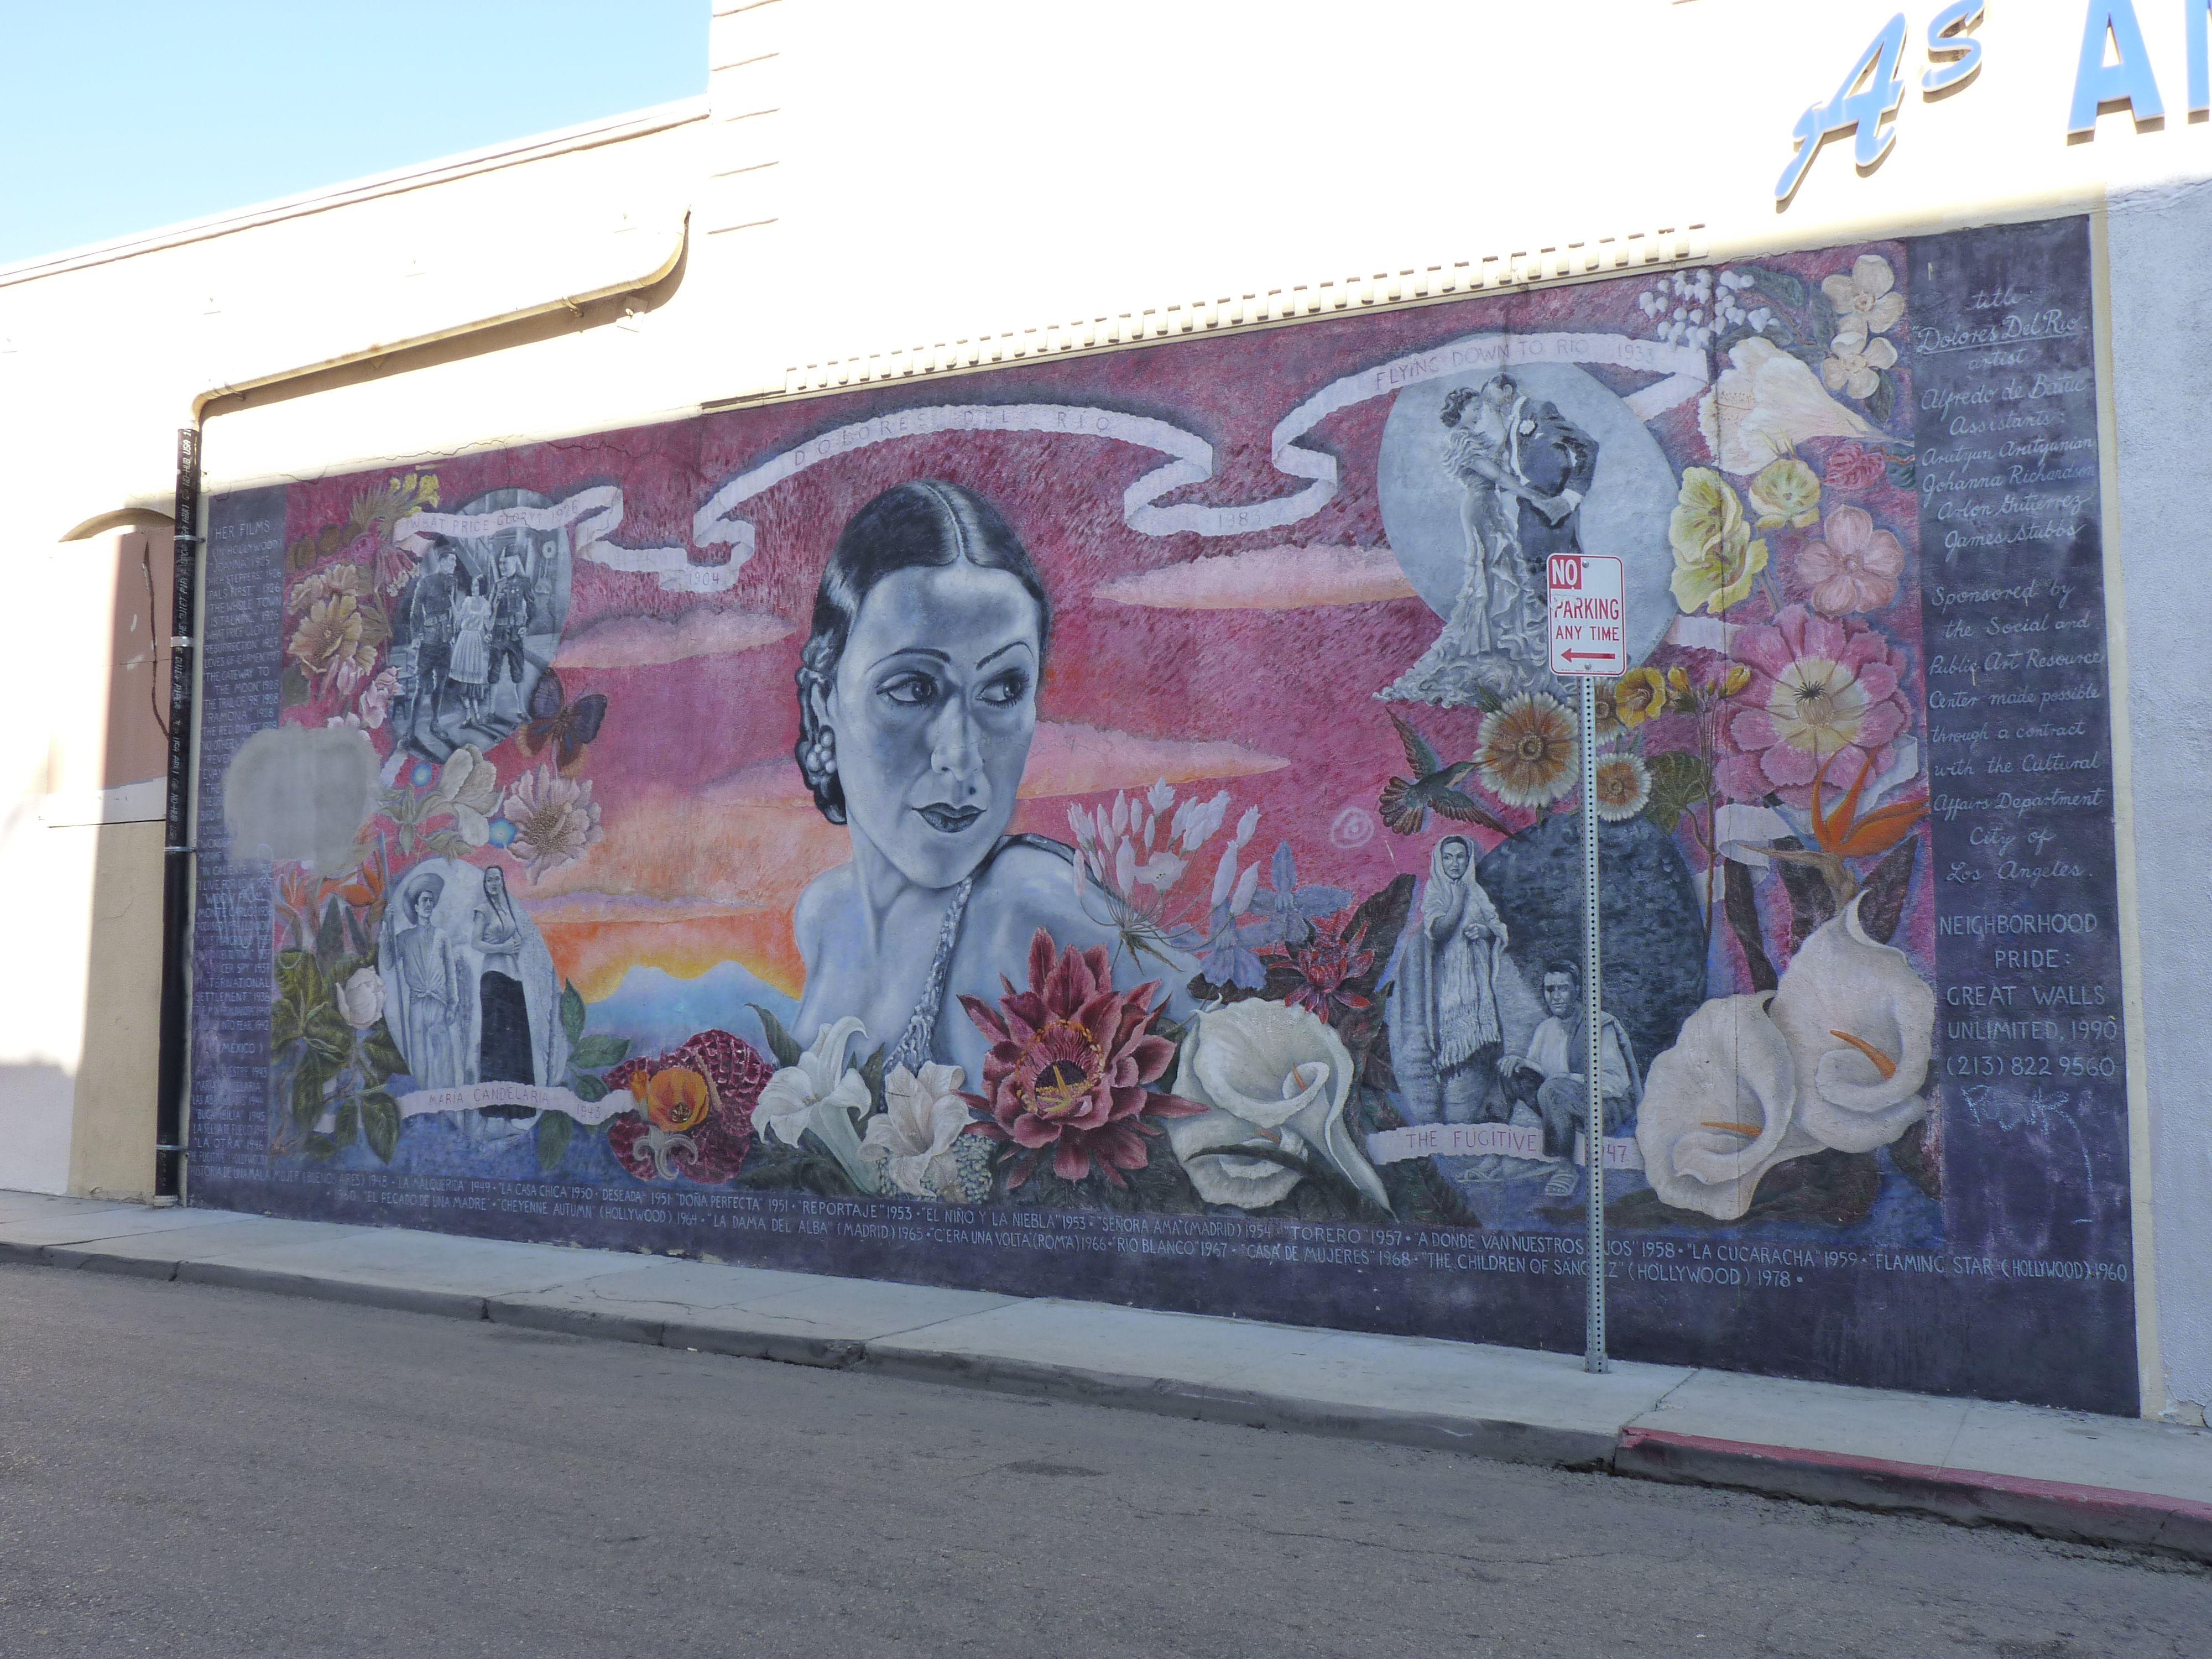 Street art in los angeles art graffiti streetart losangeles